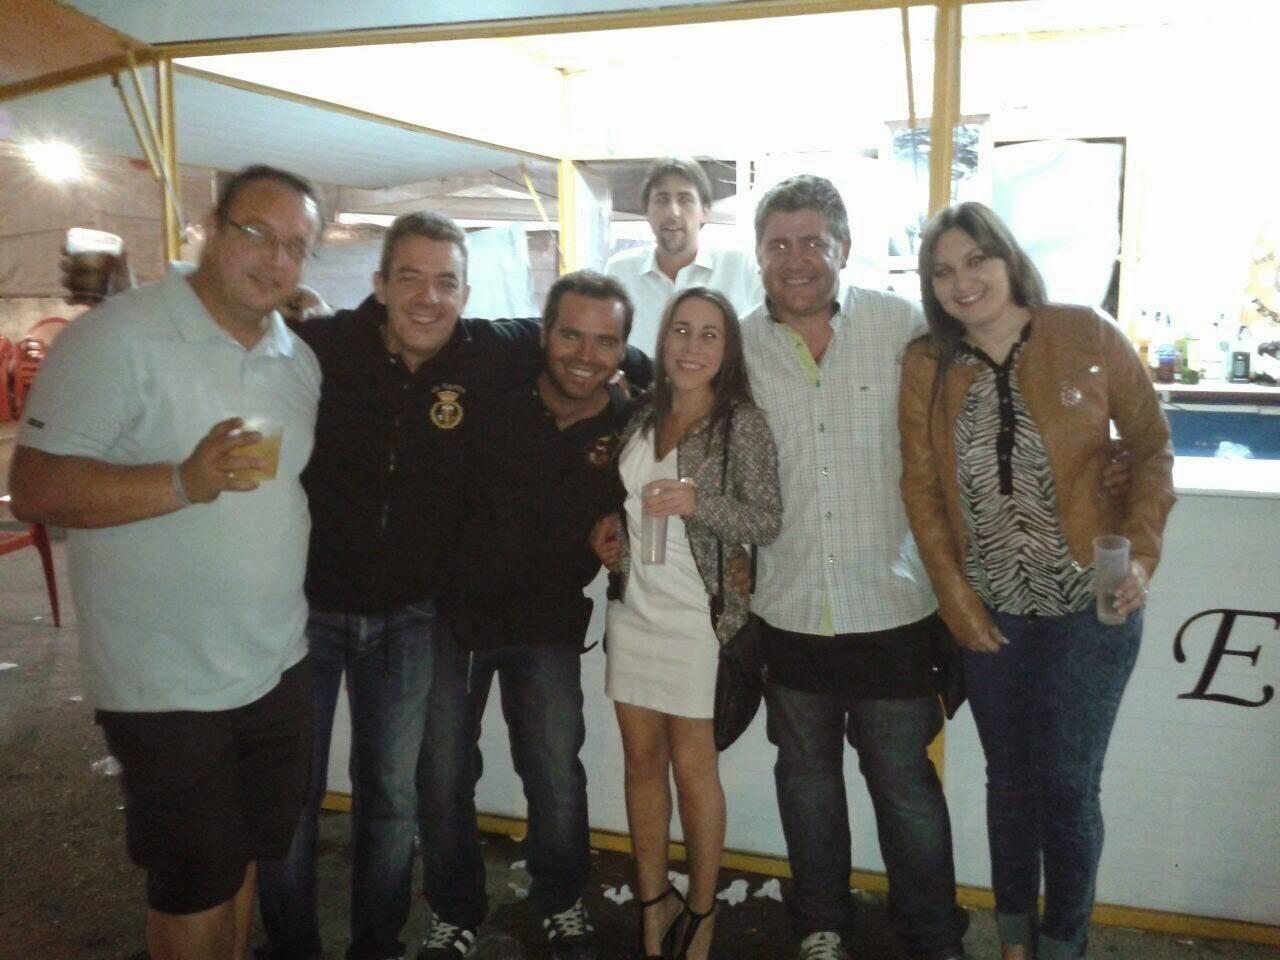 Hermanos del Santo colaborando en la Caseta - La caseta del santo, un éxito en la Feria y Fiestas 2014